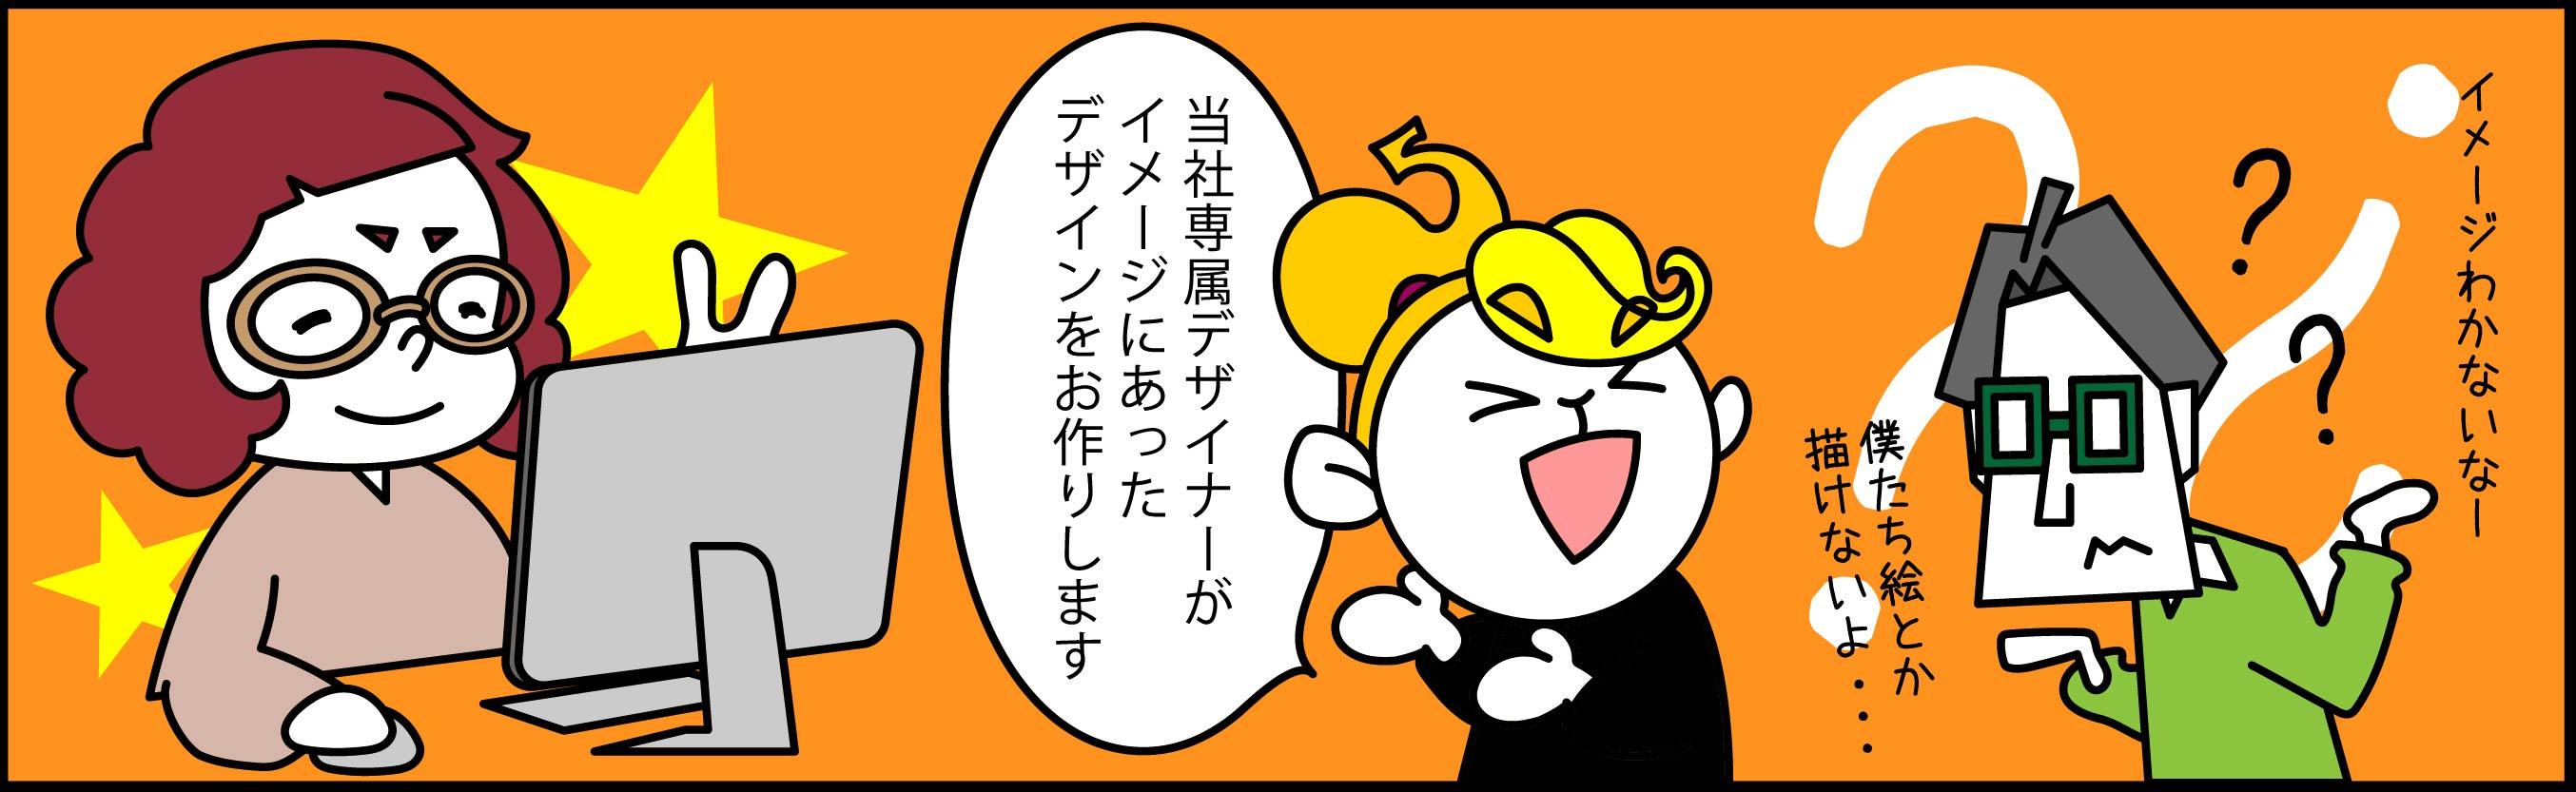 HP漫画2-05